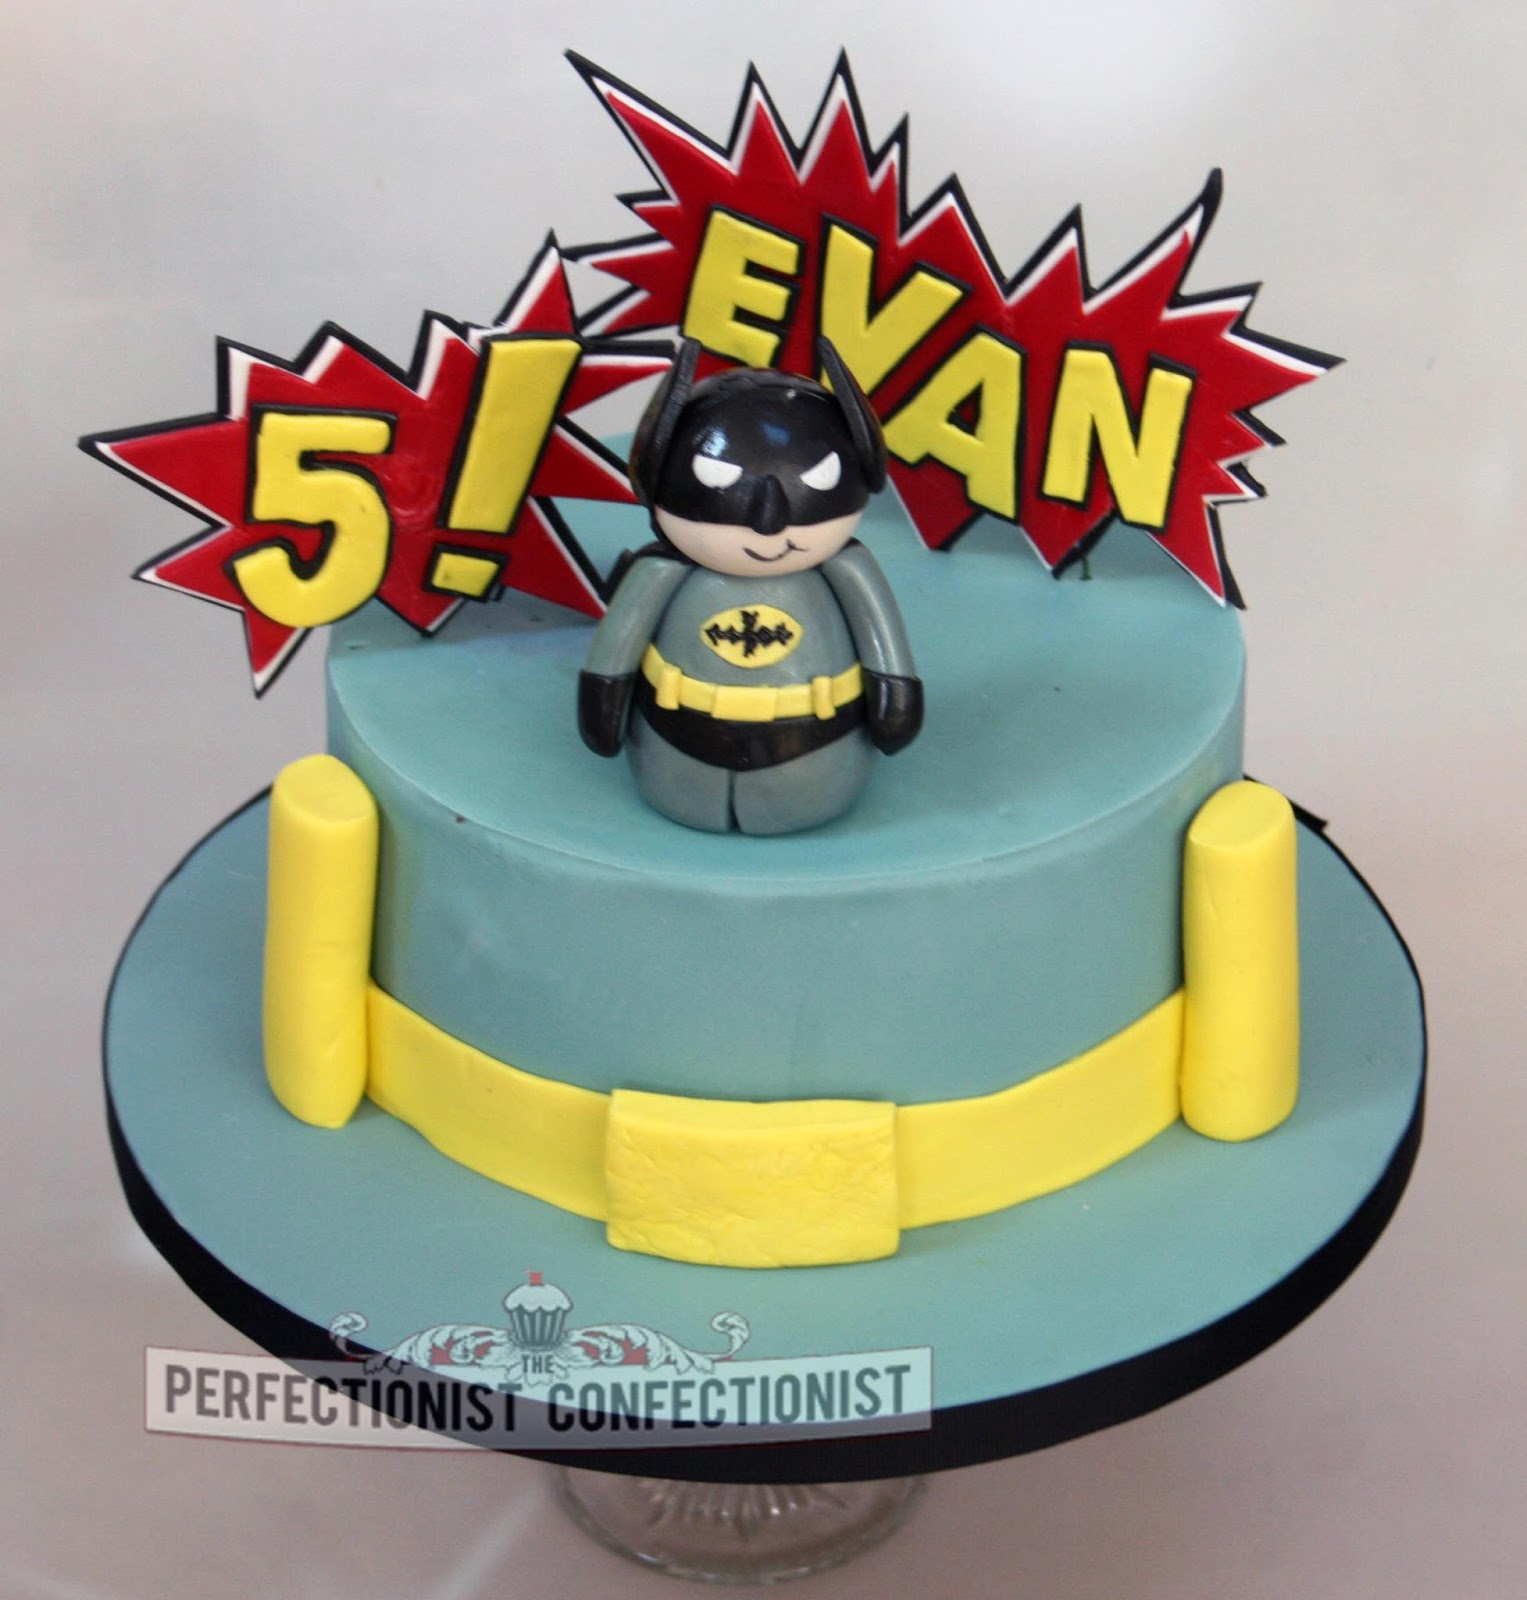 The Perfectionist Confectionist Evan Batman Birthday Cake